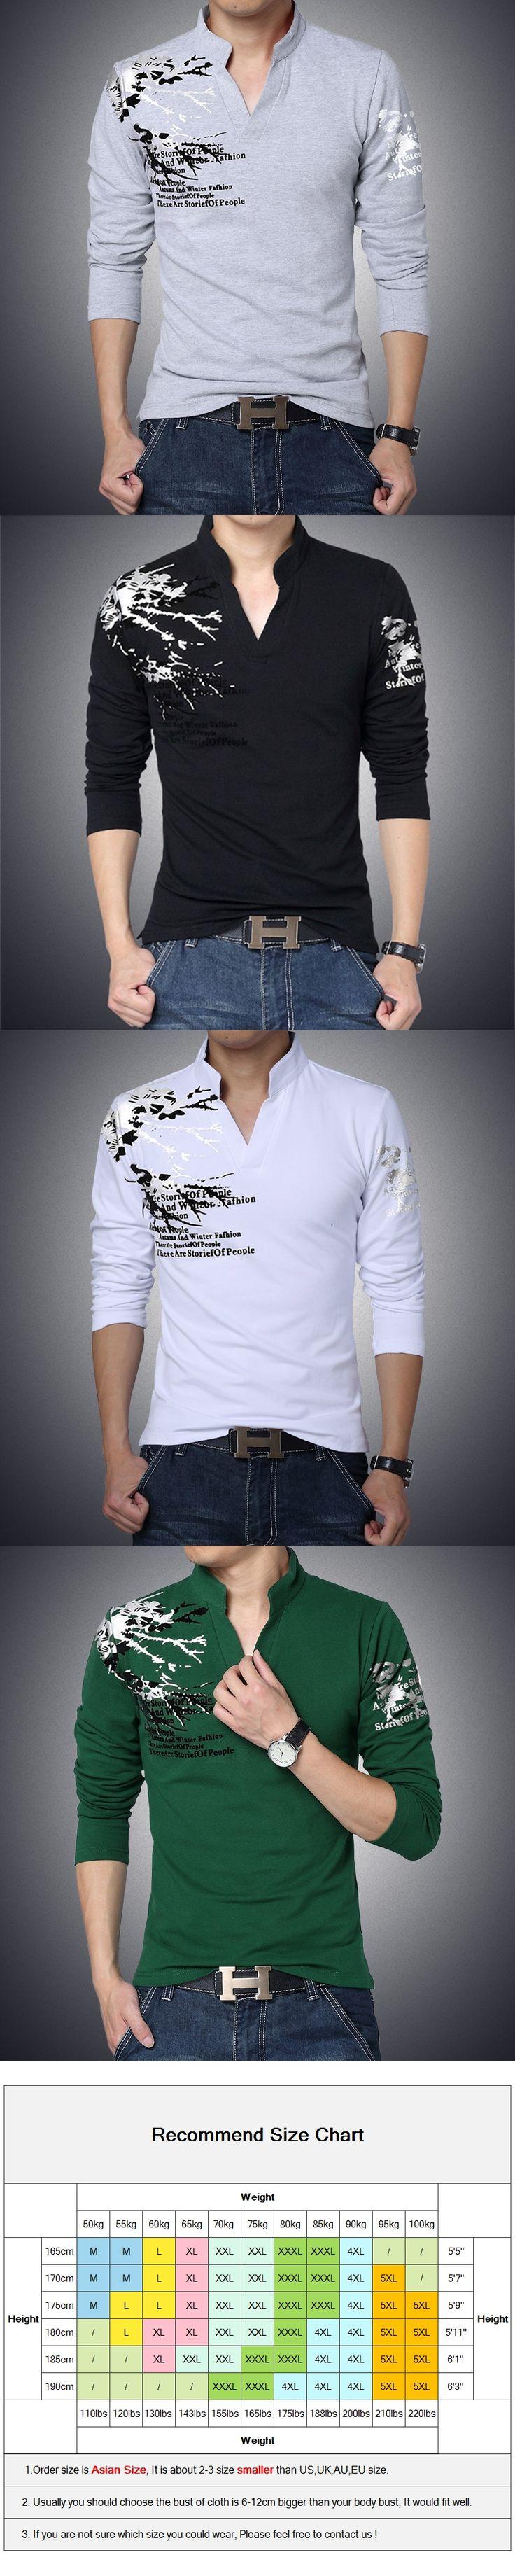 New 2017 Men Polo Shirt Fashion Brand Printed Long Sleeve Fitness Top Design Shirt Quality Male Cotton Polo Shirts Plus 4XL 5XL